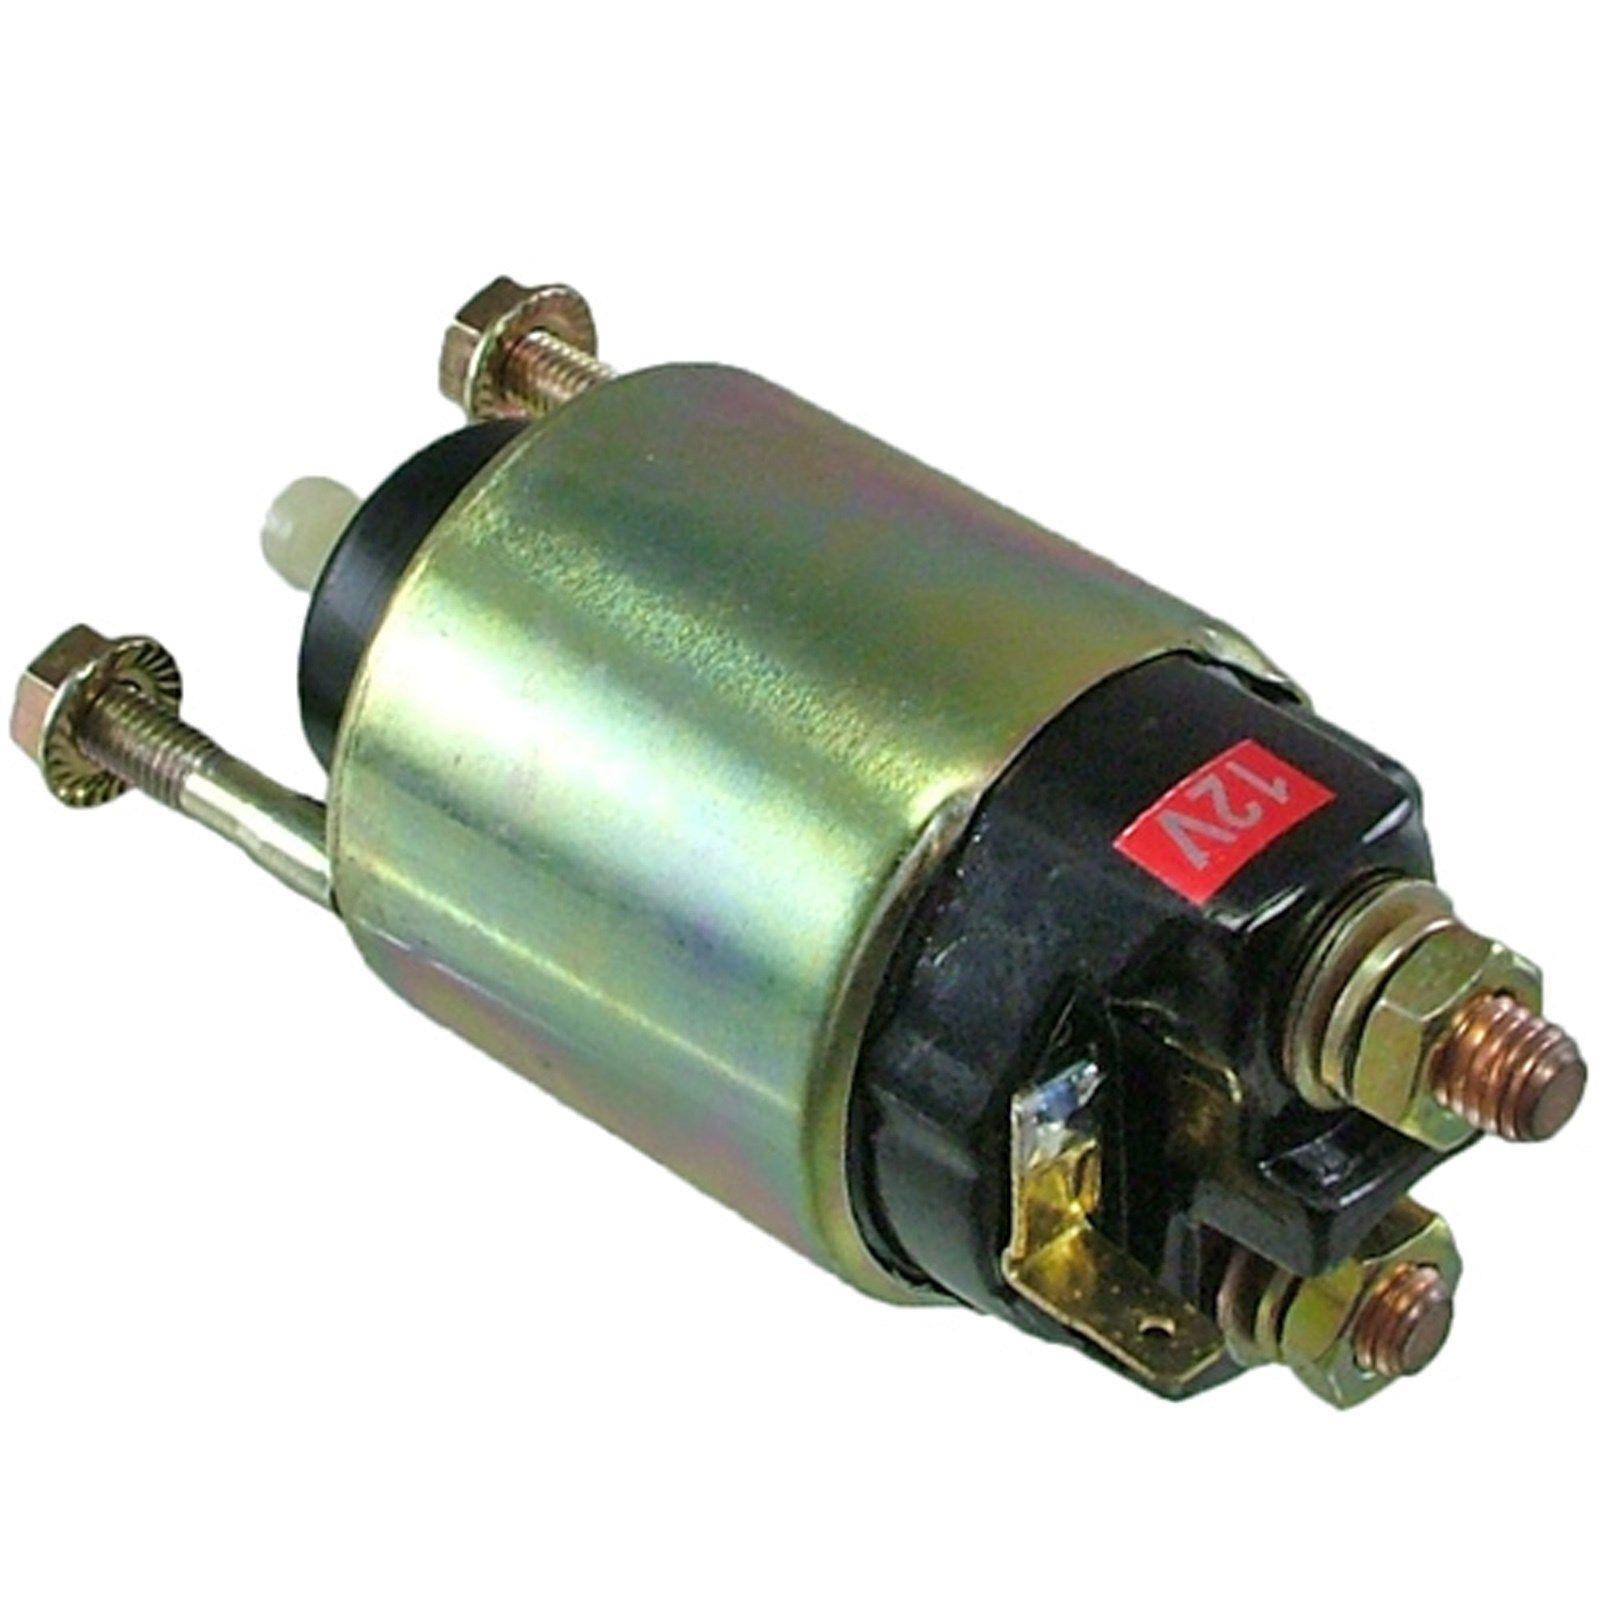 hight resolution of new starter motor solenoid relay kawasaki kohler mower 18hp 25hp 29 hp ssnd917